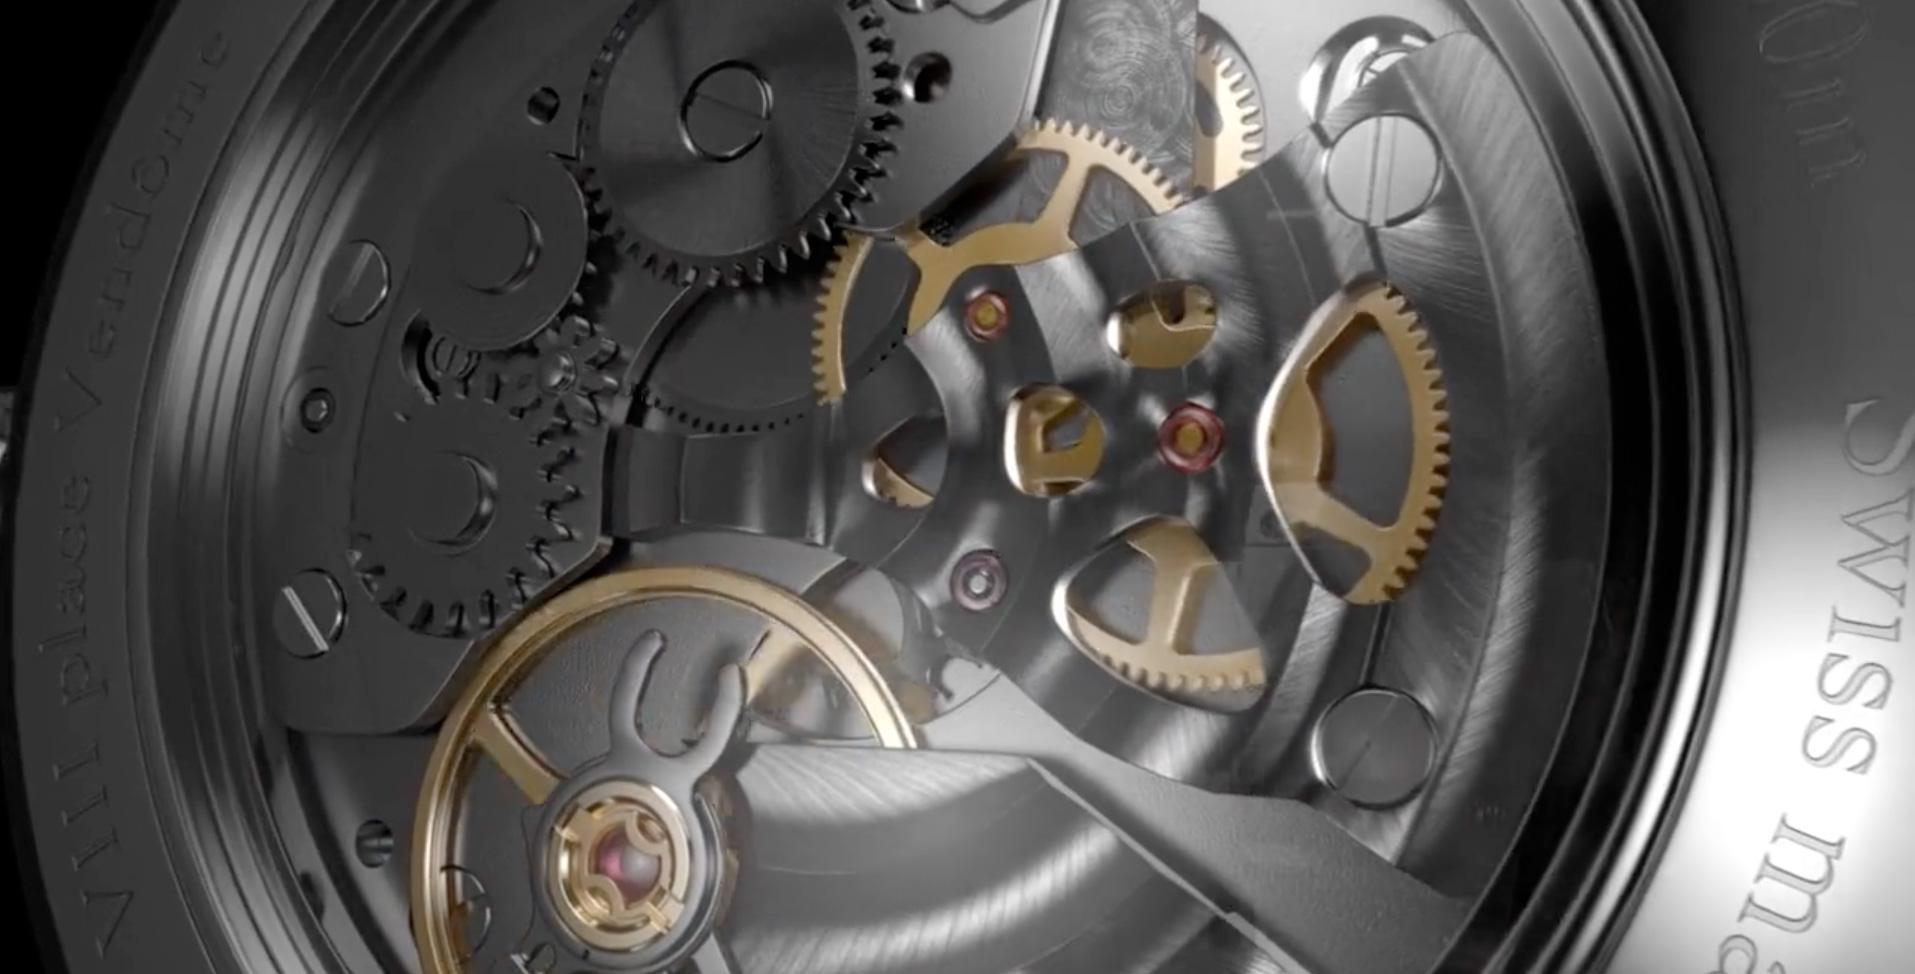 Dior VIII: digital chalet